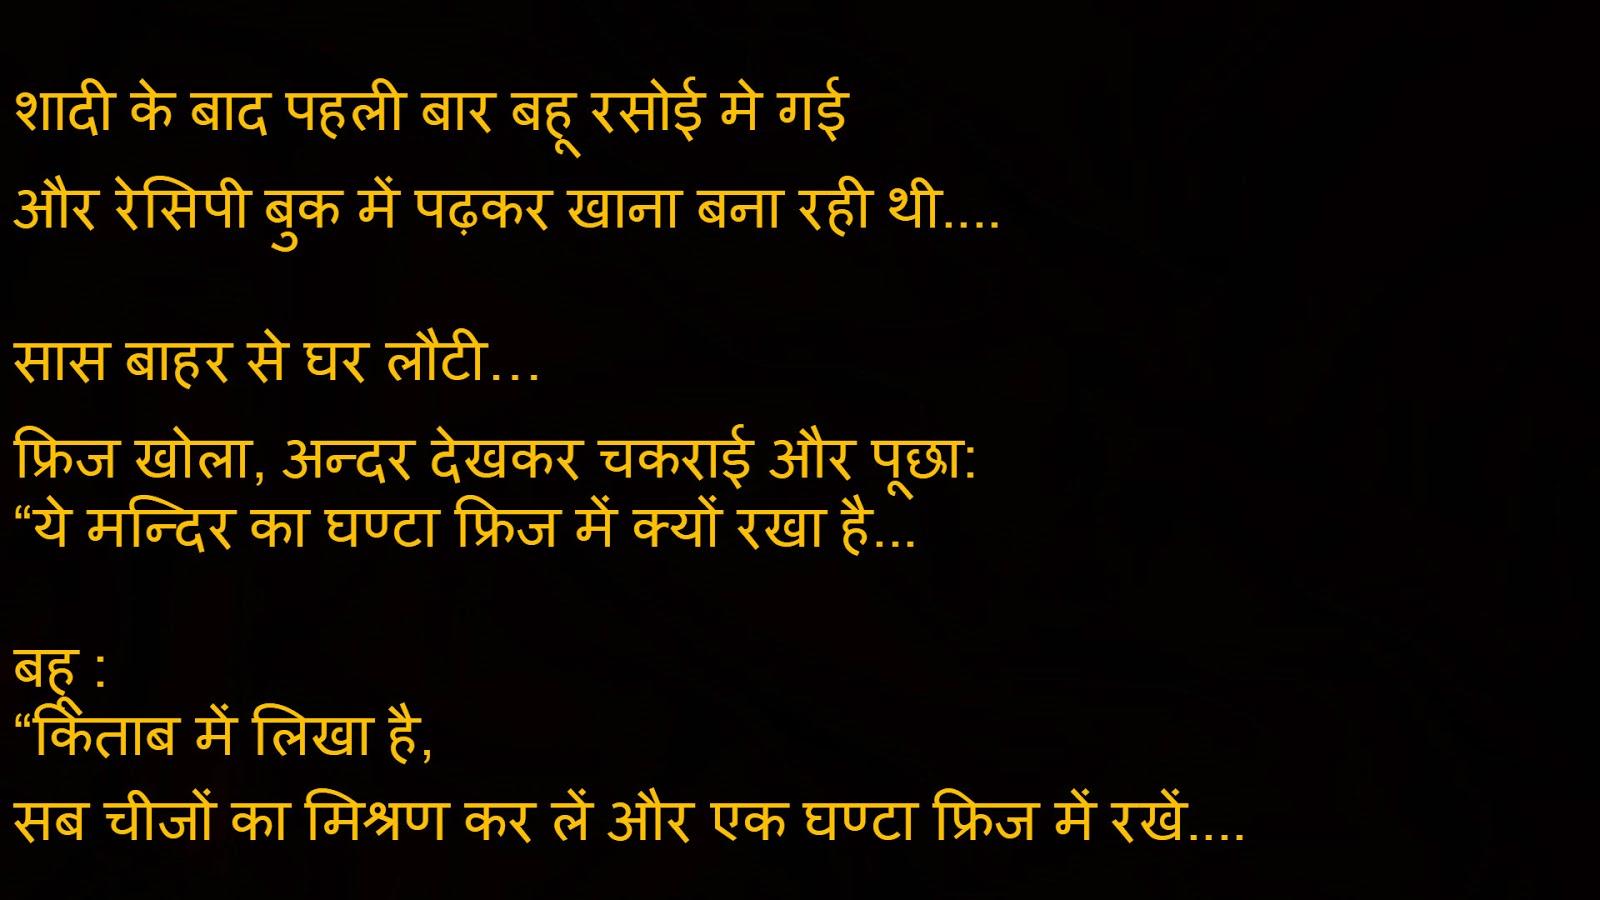 Wallpaper download jokes - Whatsapp Funny Jokes Images Download 2016 Whatsapp Jokes Hindi Funny Whatsapp Images Modi Lalu Hindi Masti Funny Jokes Wallpapers Hindi Funny Pictures